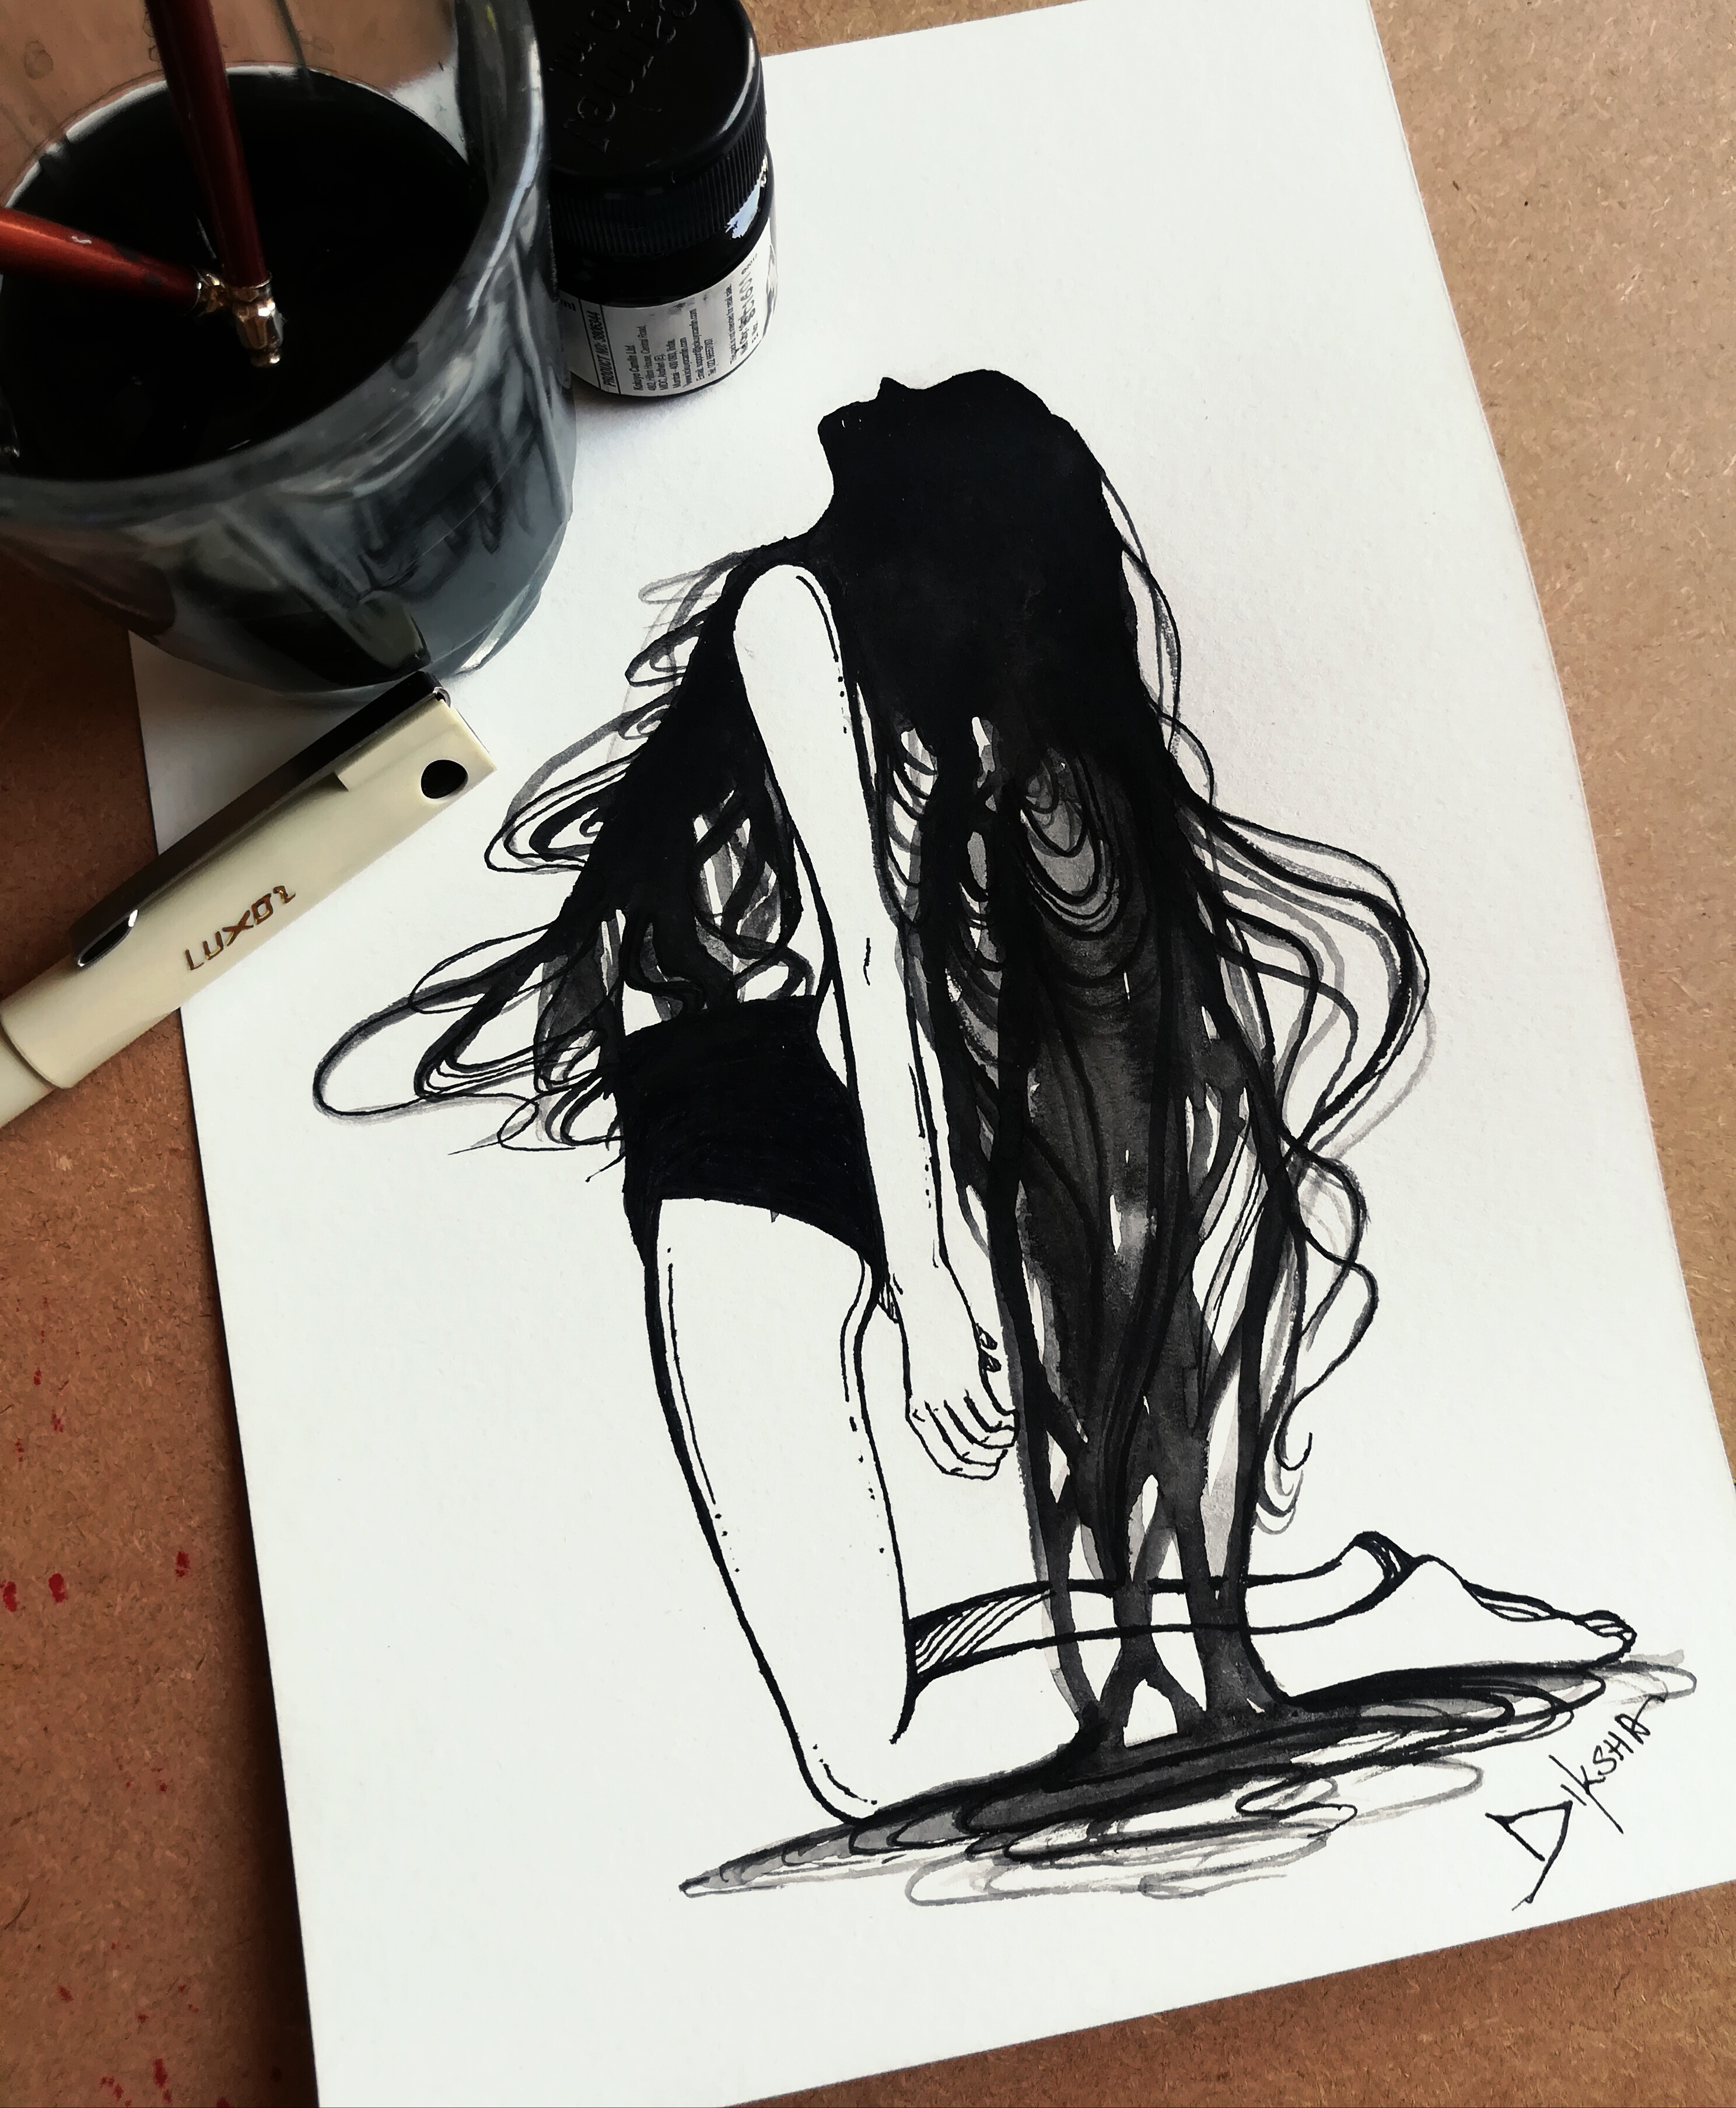 Toxic Mind by Diksharpner